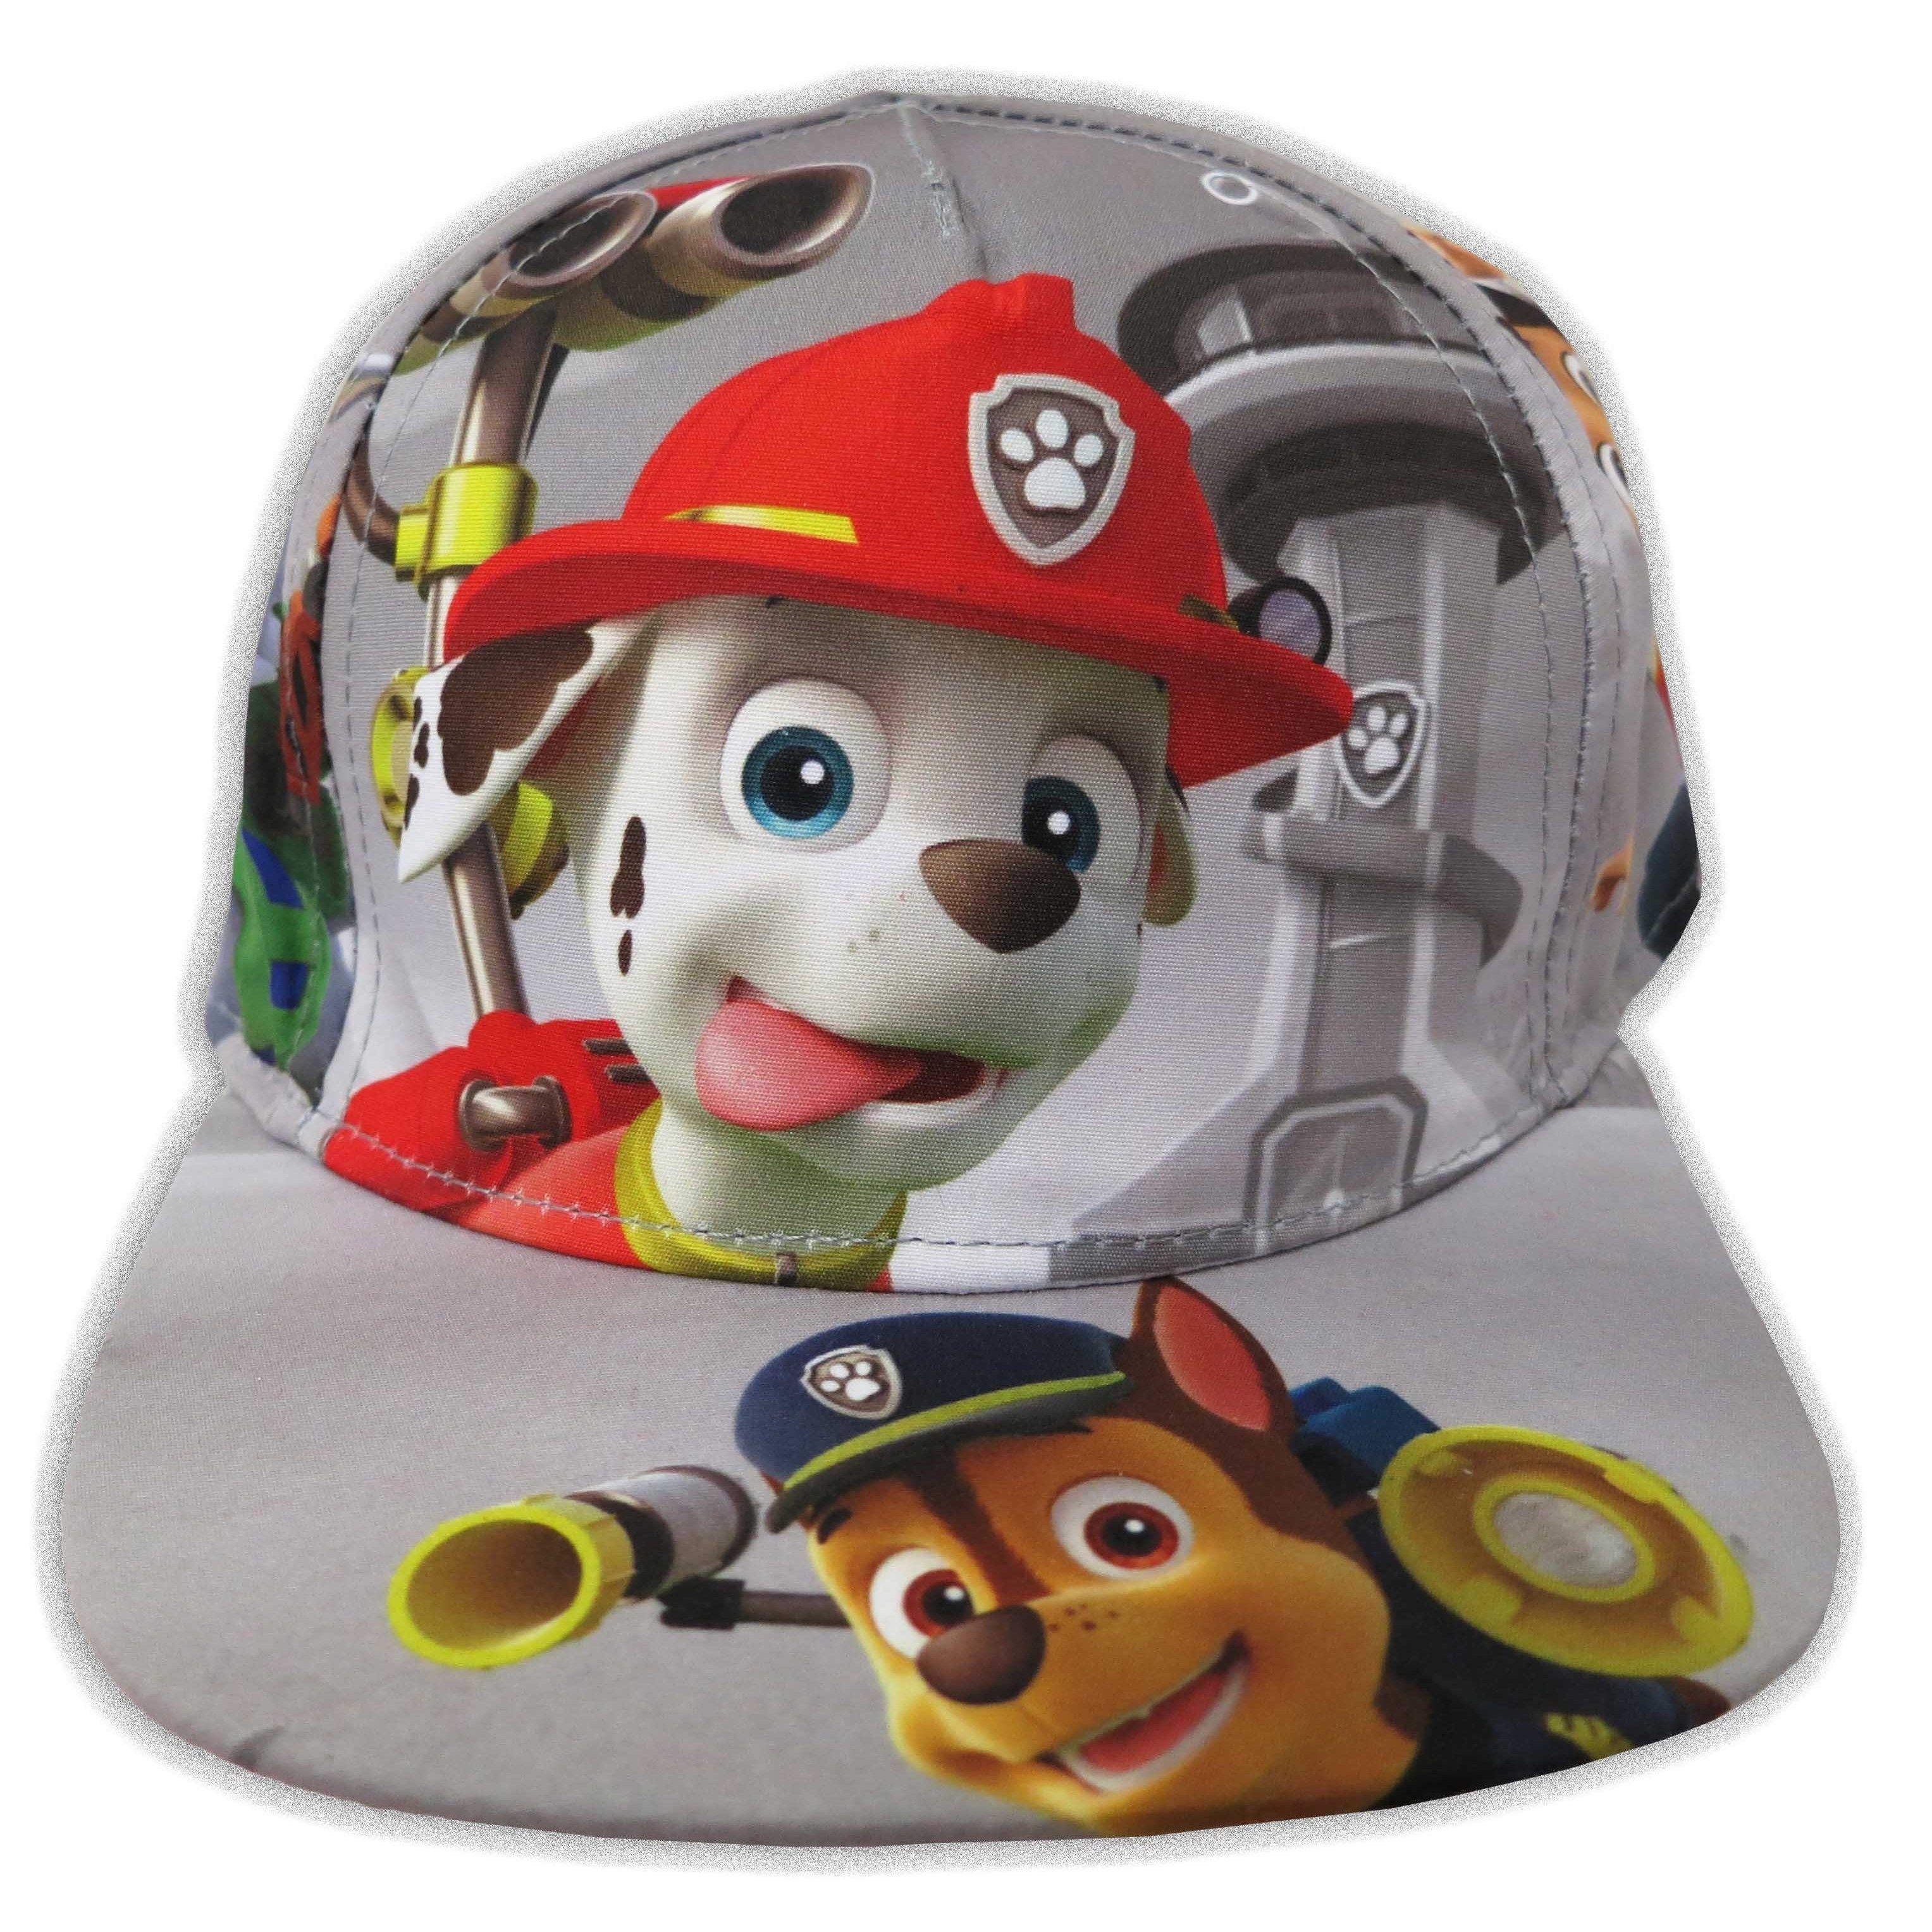 7f32ad66c0a Nickelodeon Toddler Boys Paw Patrol Grey Cotton Baseball Cap - One ...